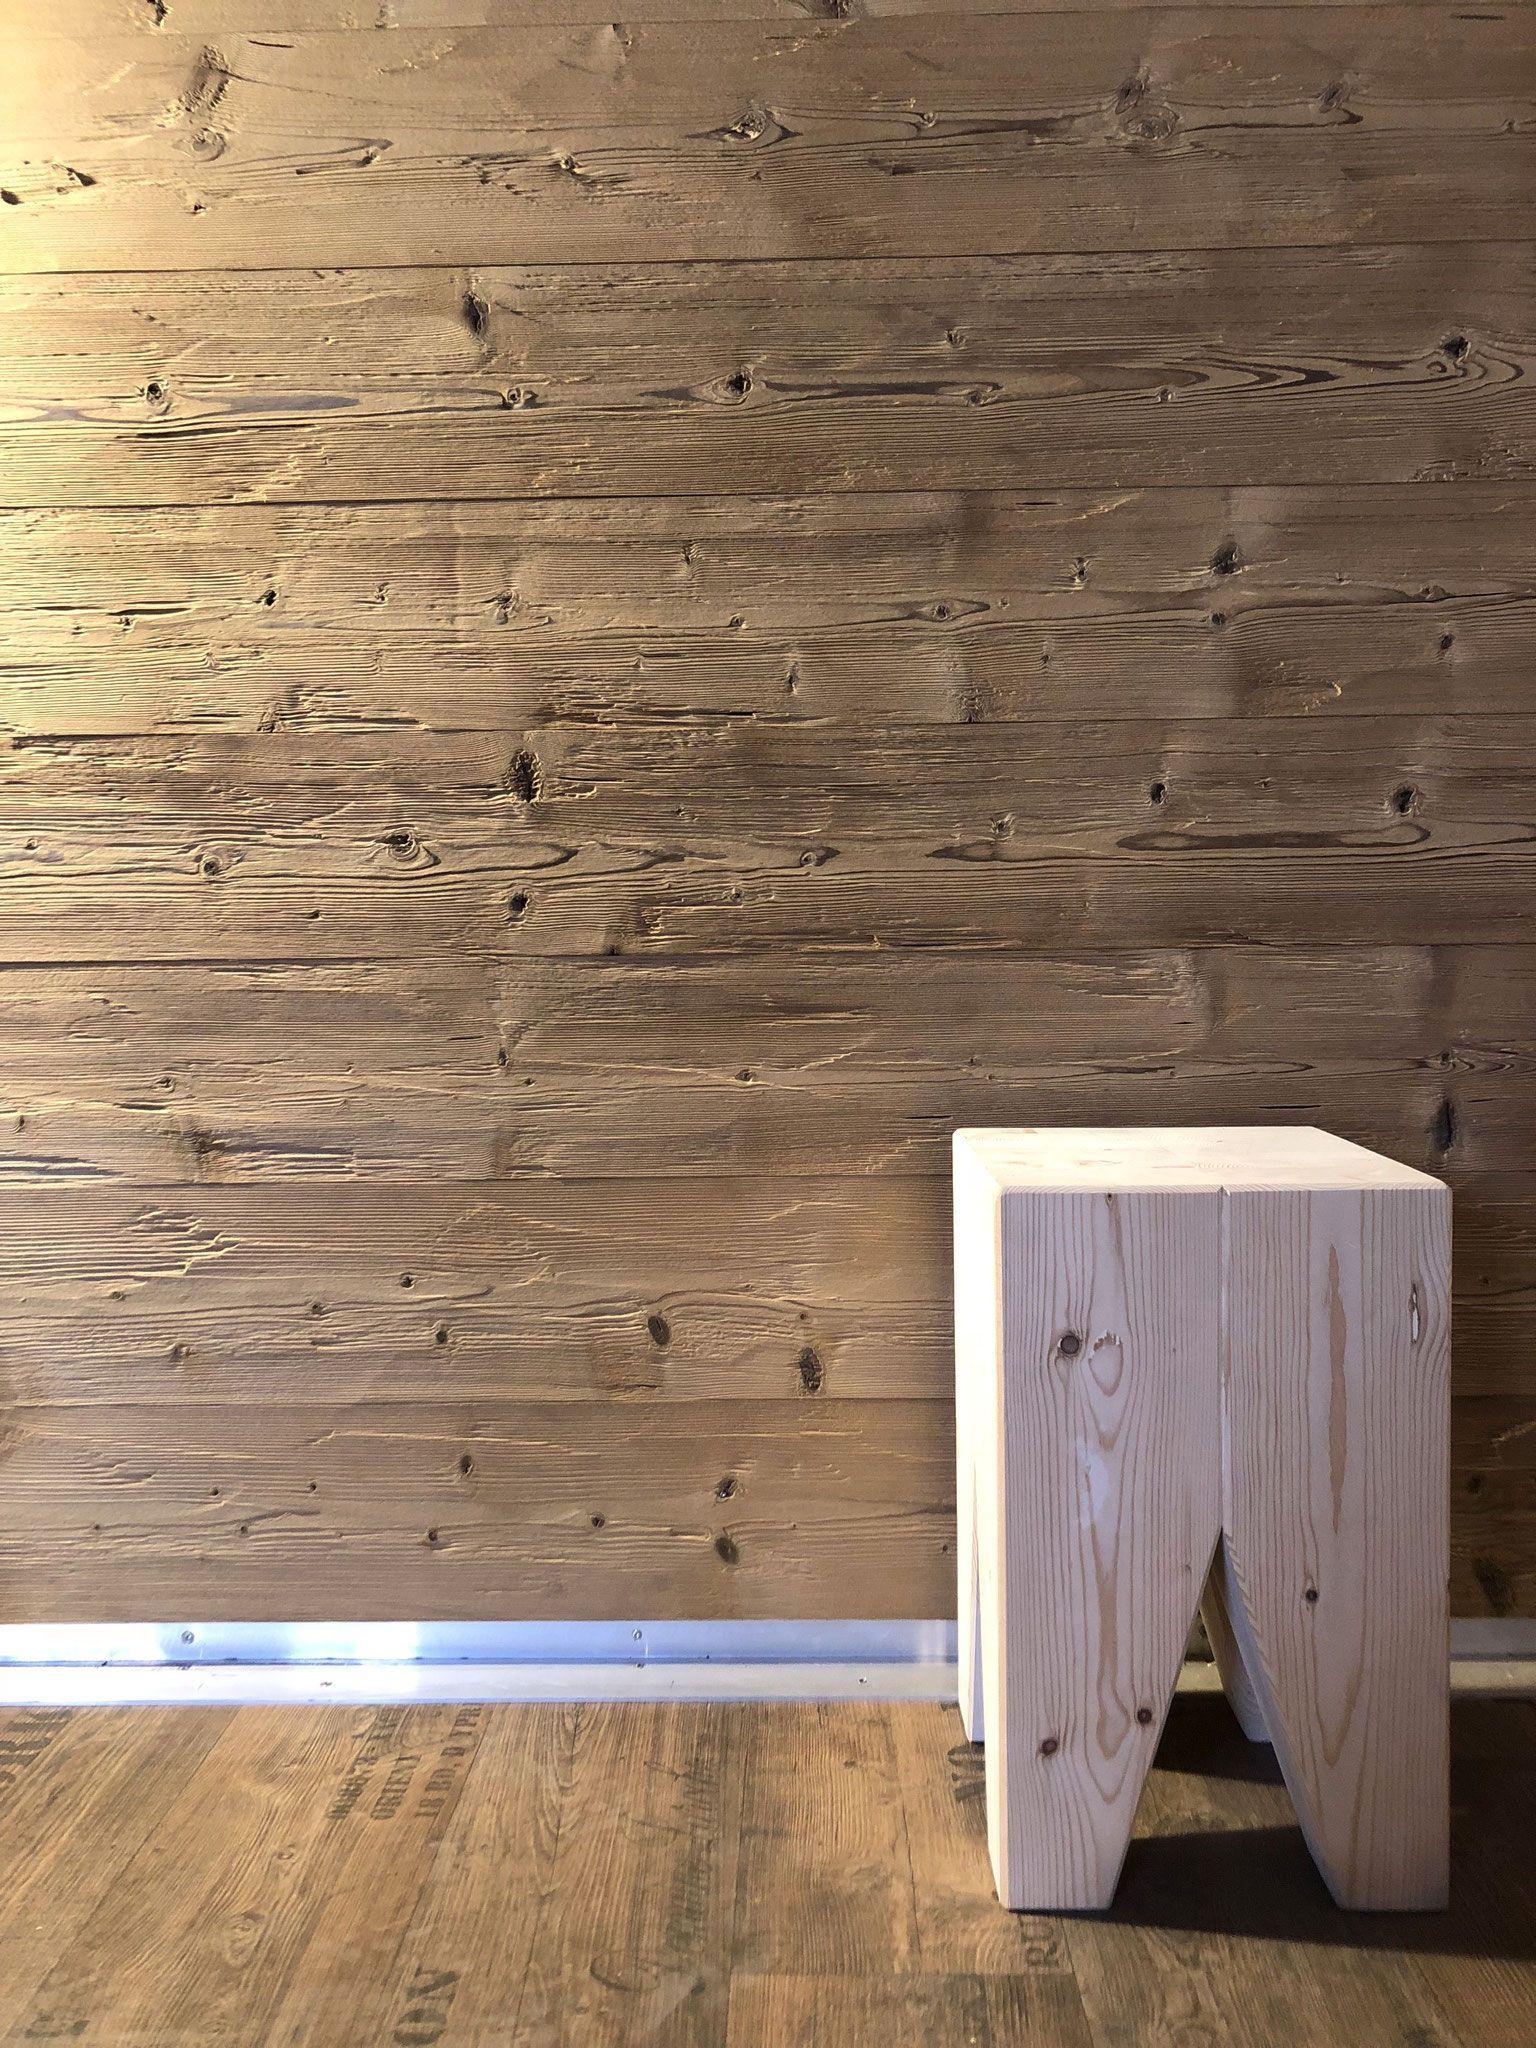 Wohnzimmer Vintage Holz Galerie In 2020 Small Lounge Mirror Decor Big Furniture